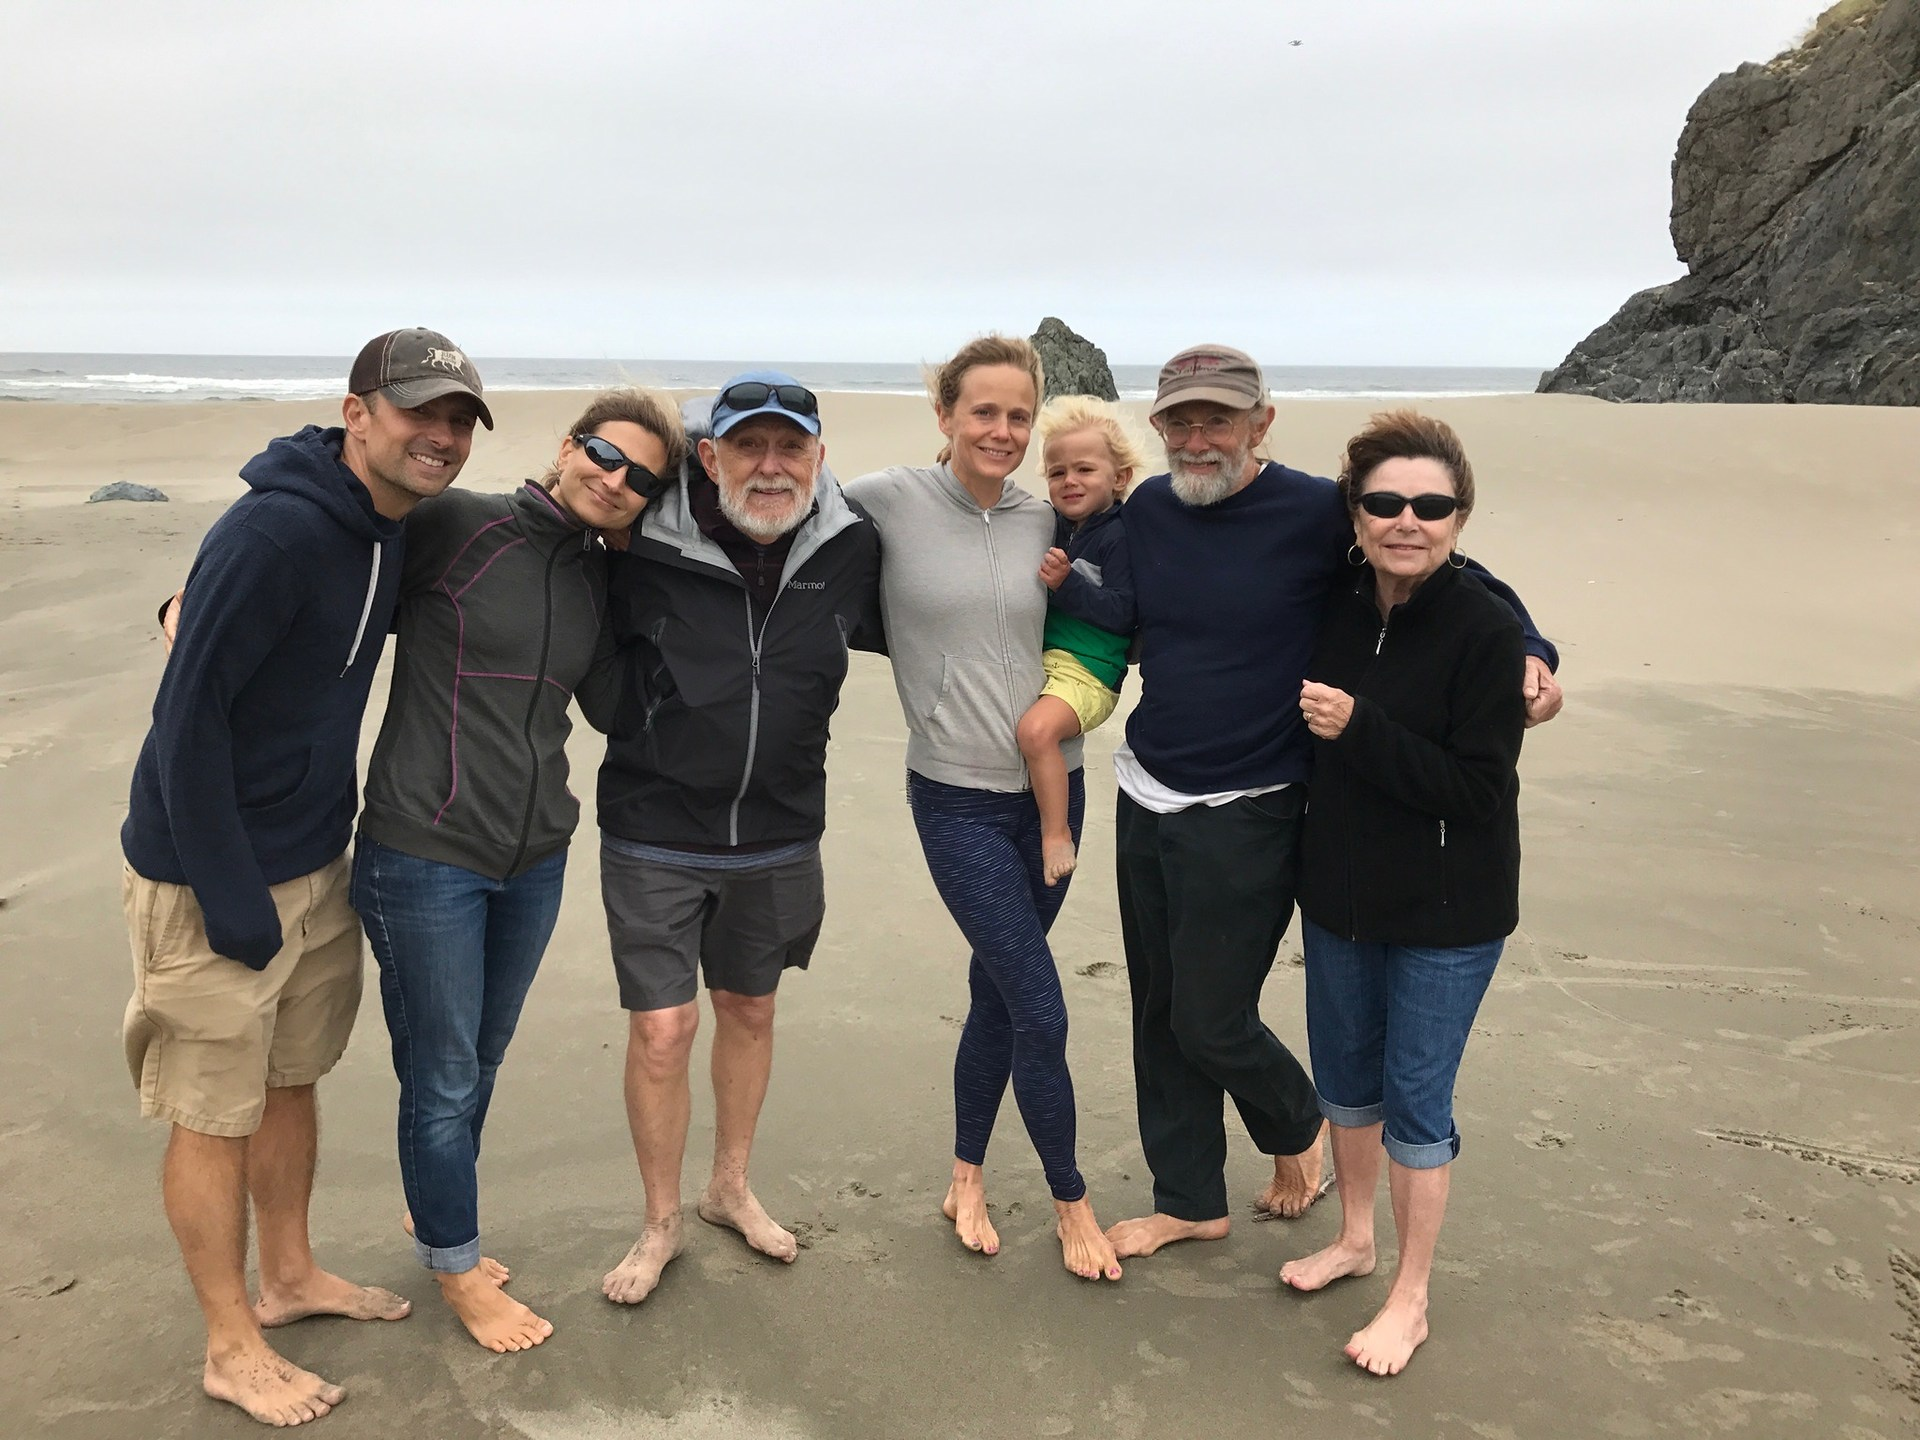 On the Oregon coast with family